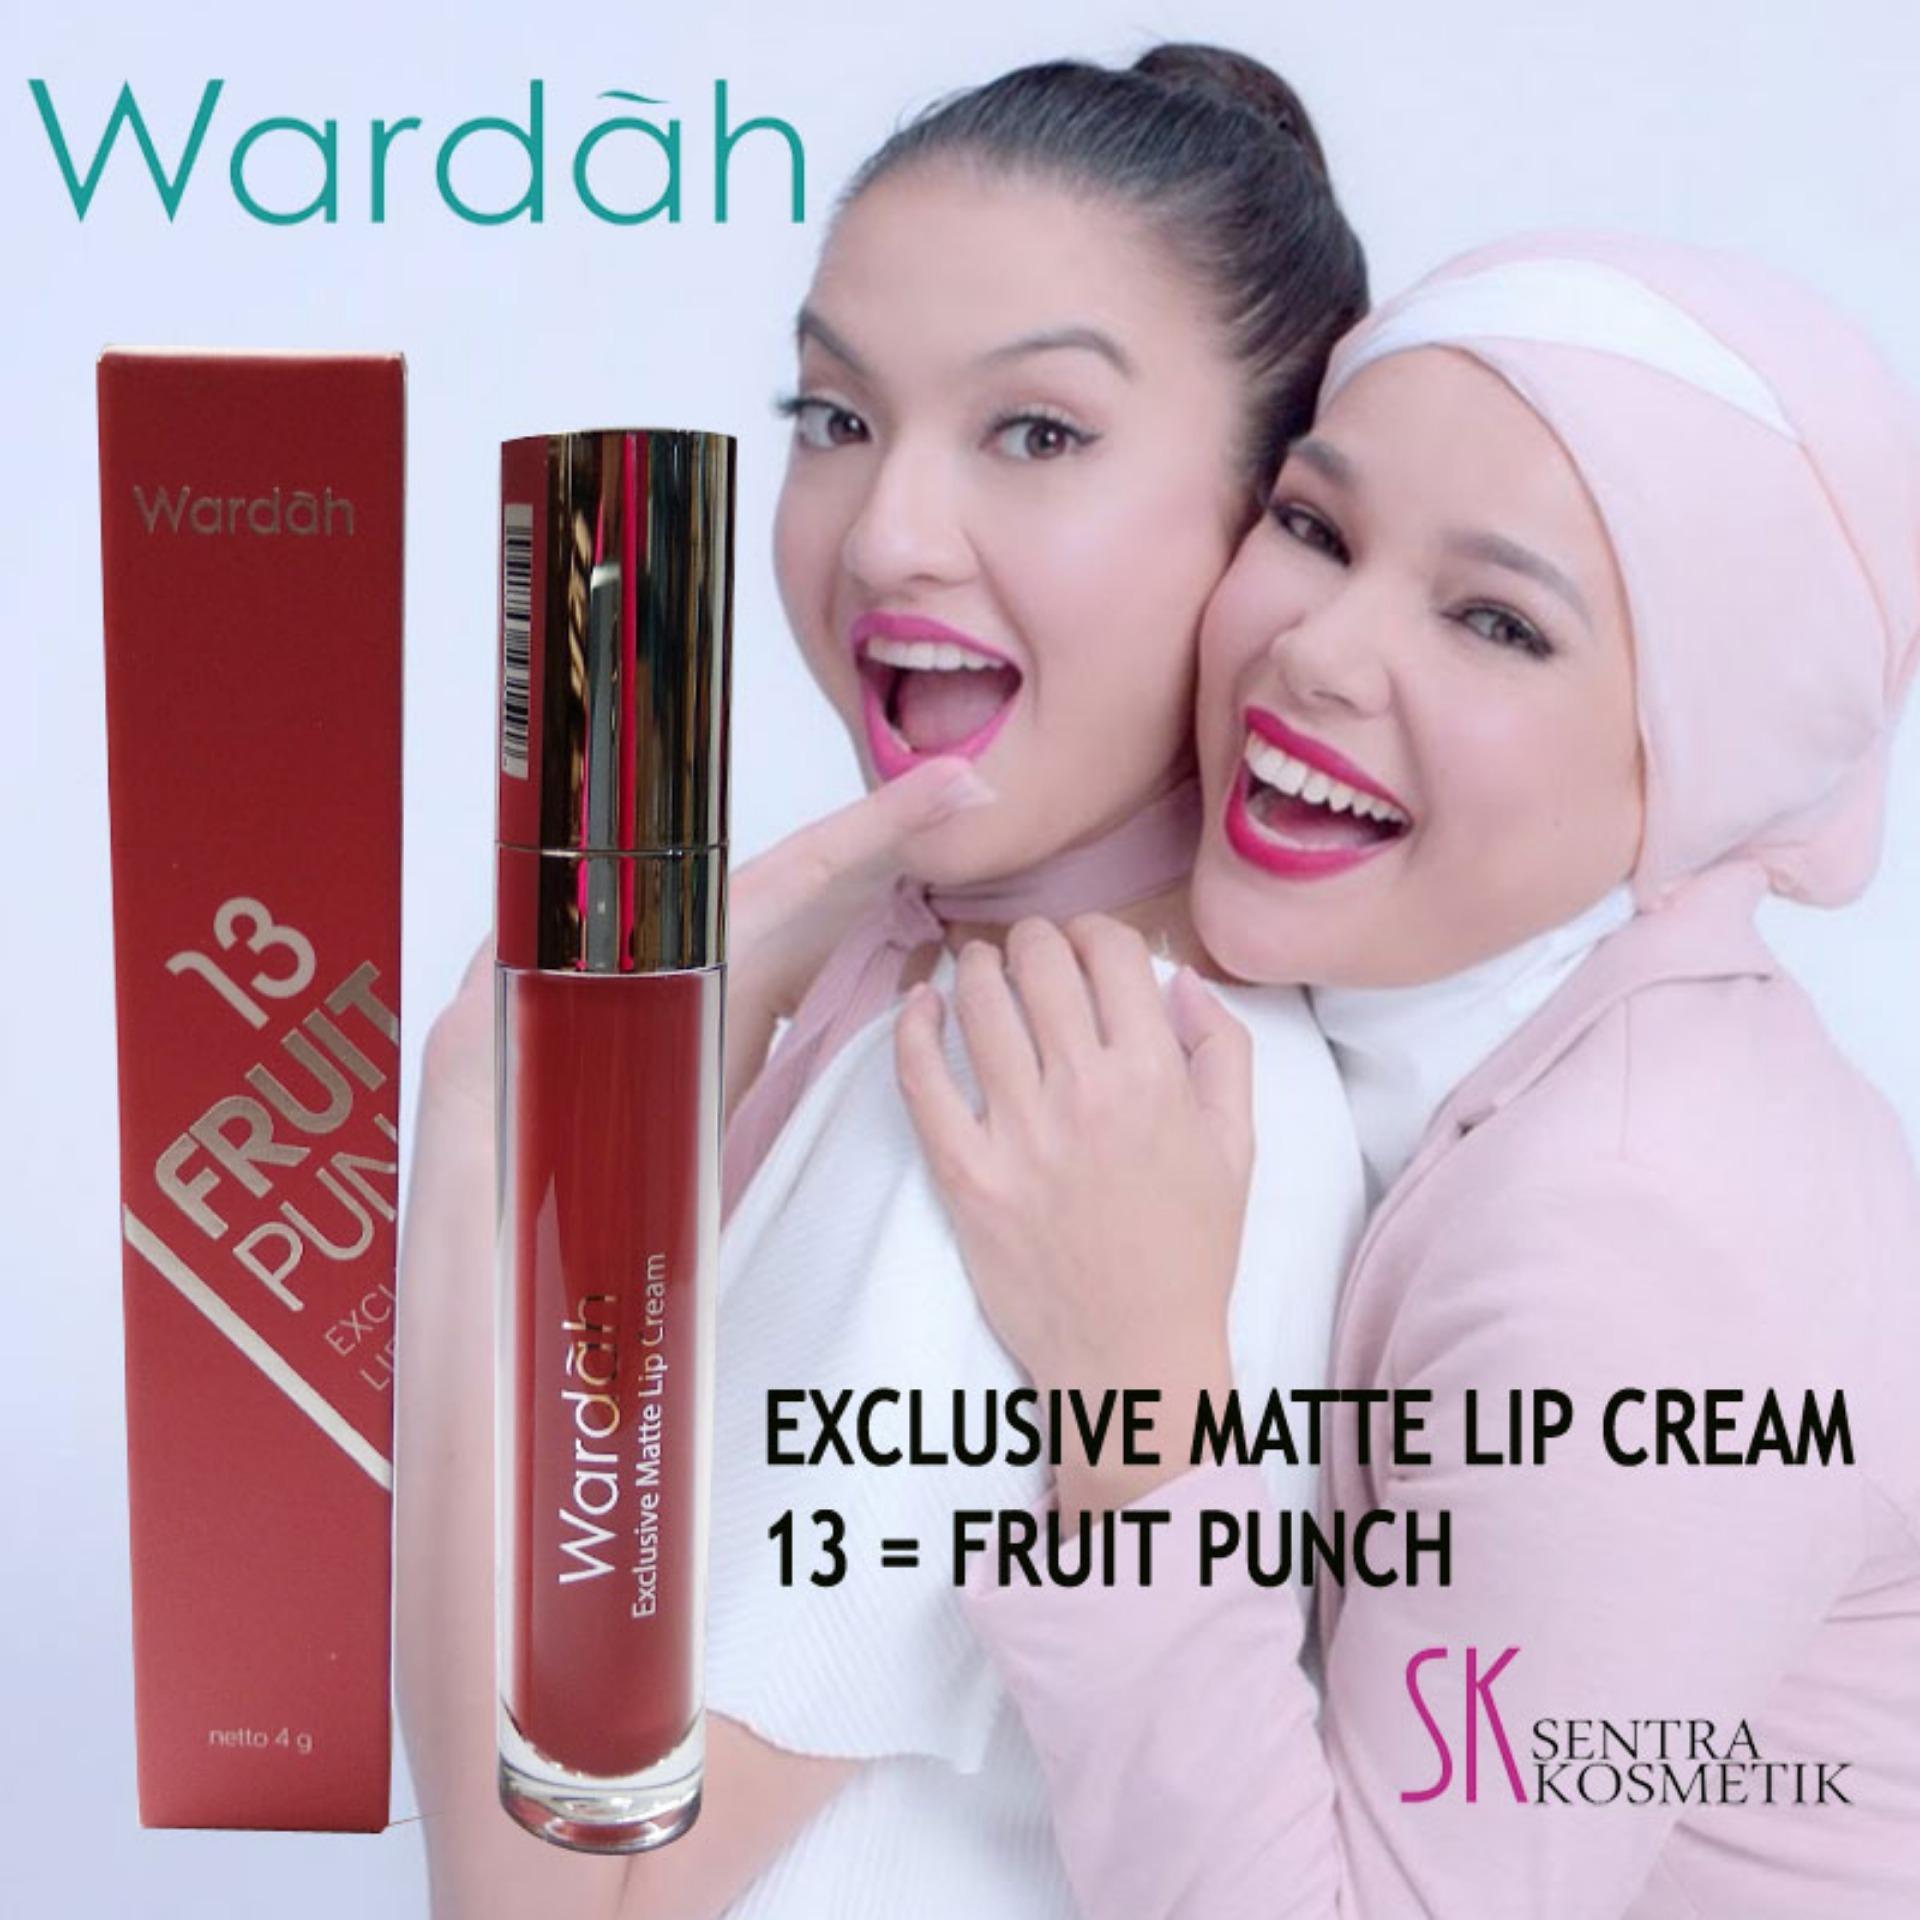 Wardah Exclusive Matte Lip Cream No 14 My Honey Bee Lazada Indonesia Original Cair